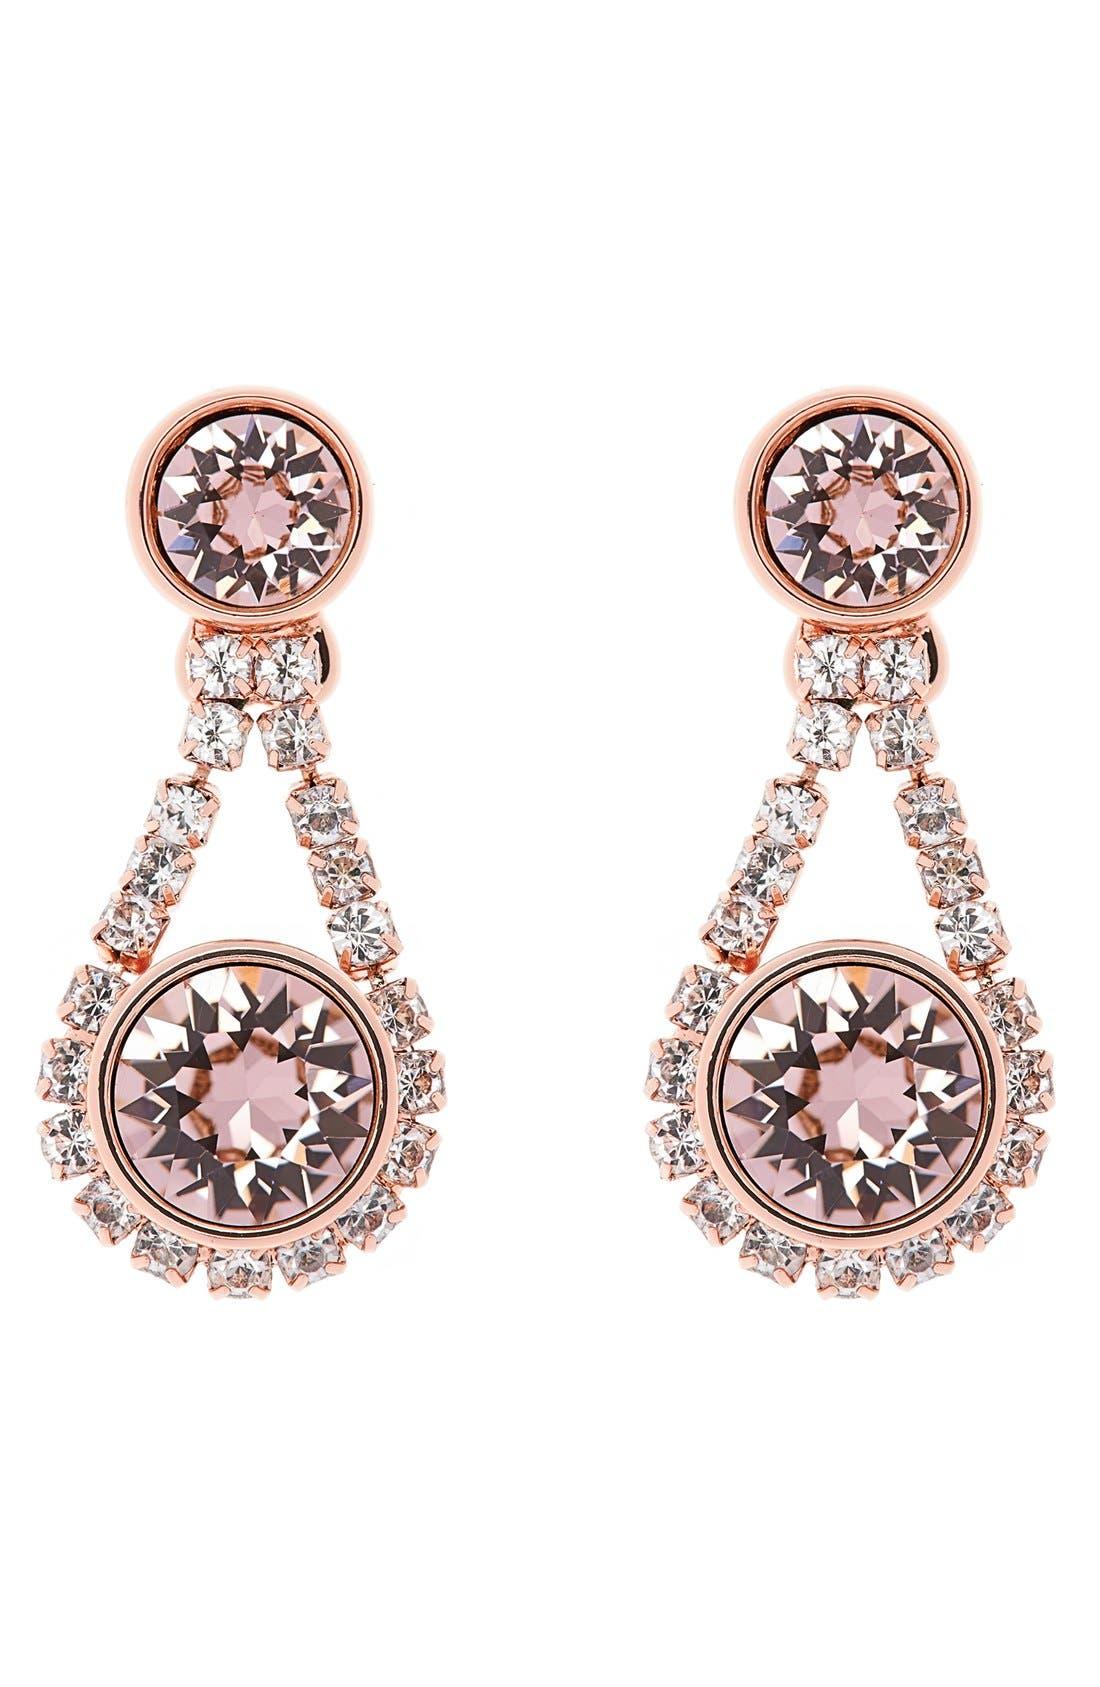 Main Image - Ted Baker London 'Crystal Daisy' Drop Earrings